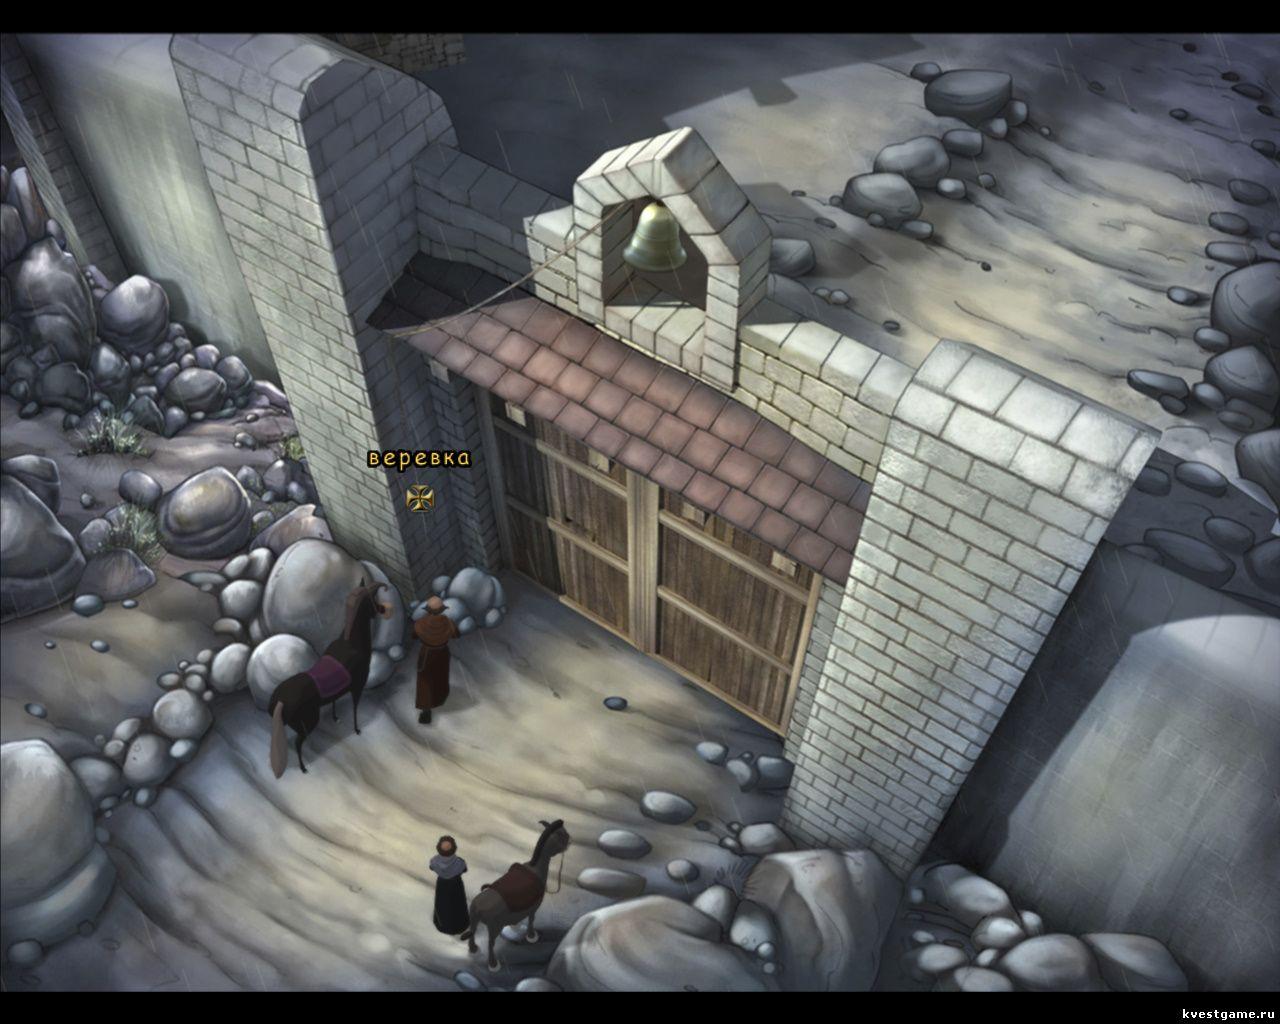 Murder in the Abbey - Леонардо и Бруно у ворот аббатства (глава 1)